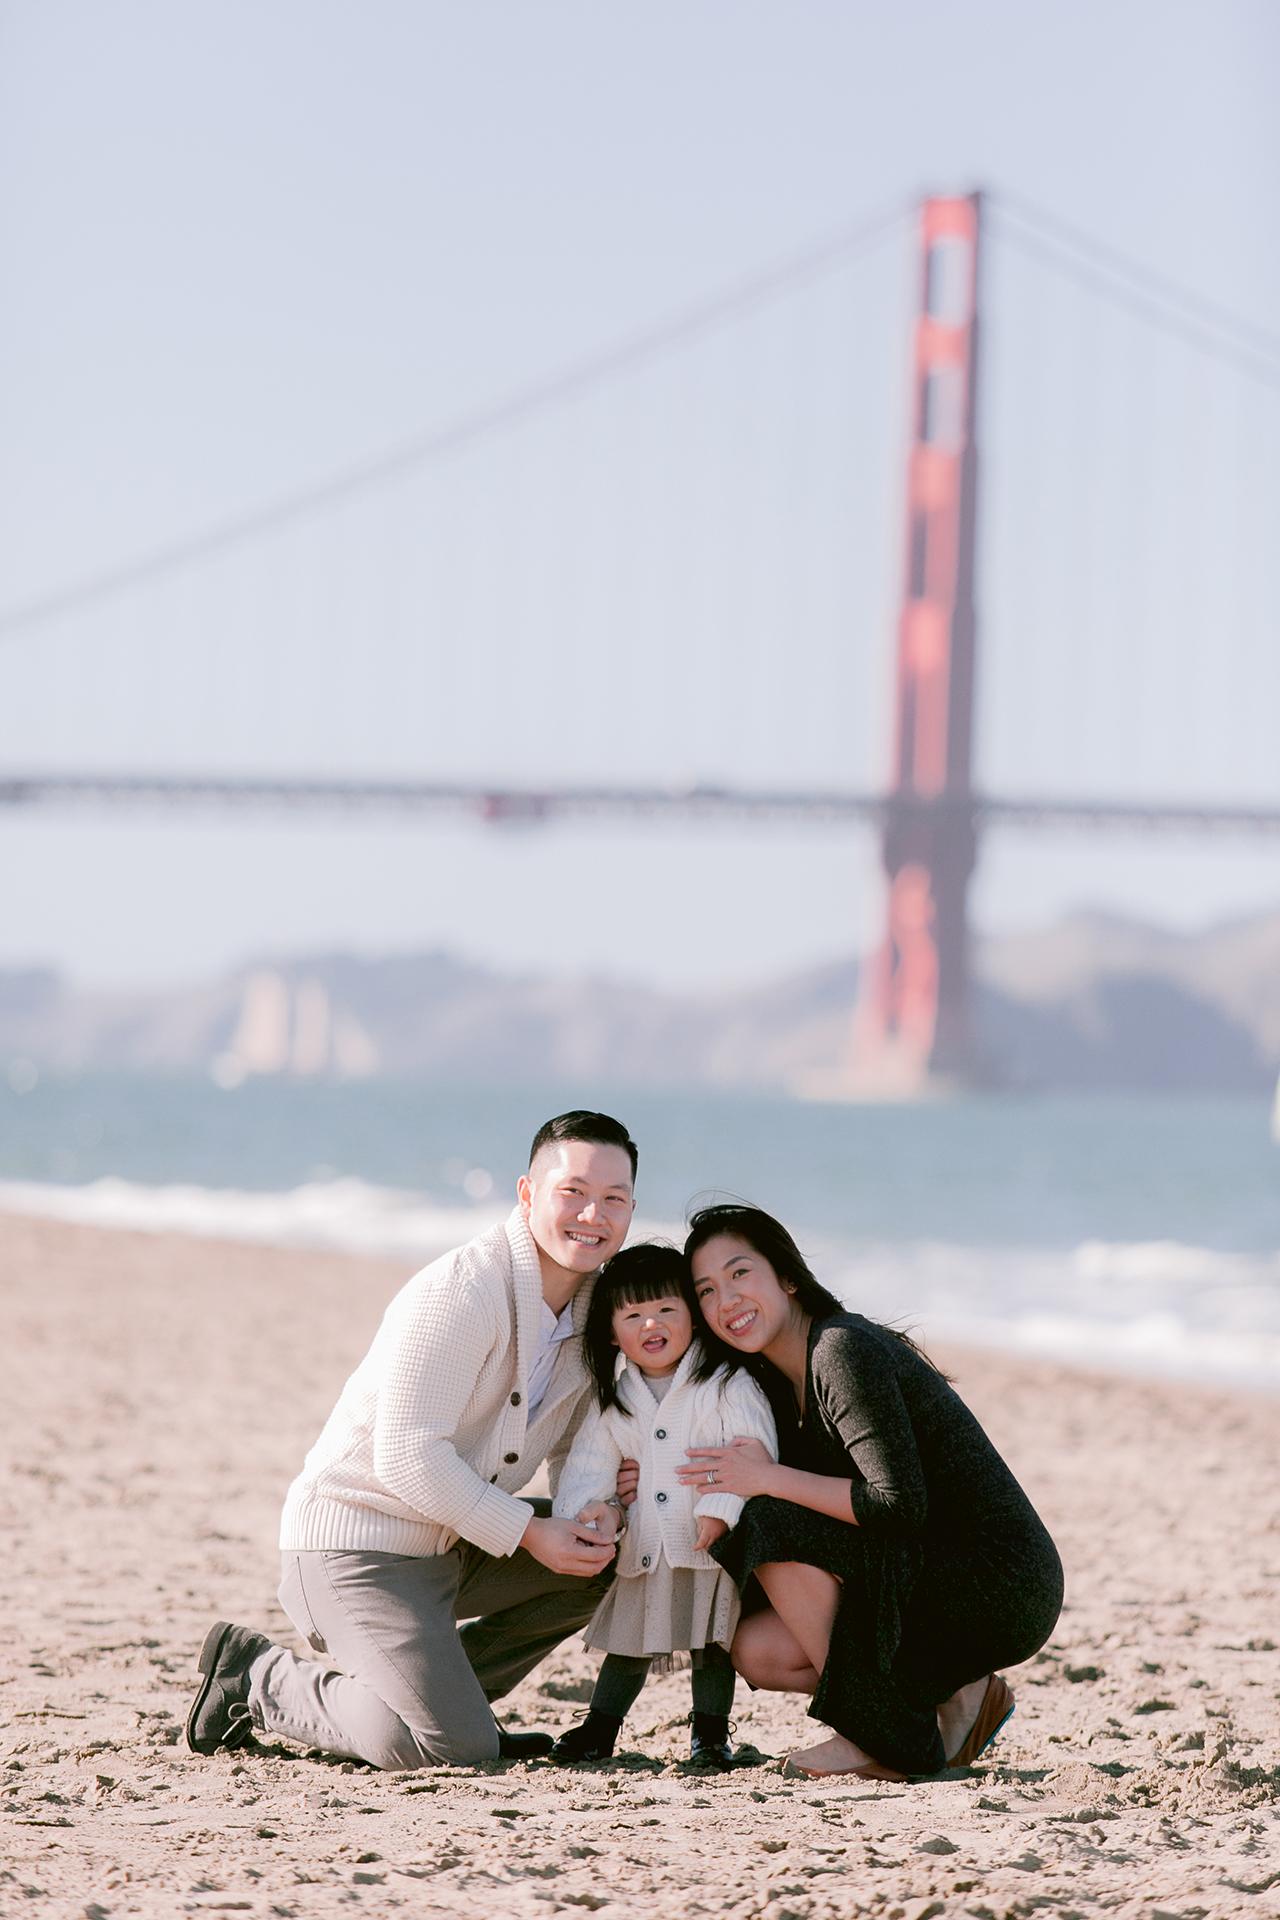 San_Francisco_Children_and_Family_Portrait_006.jpg